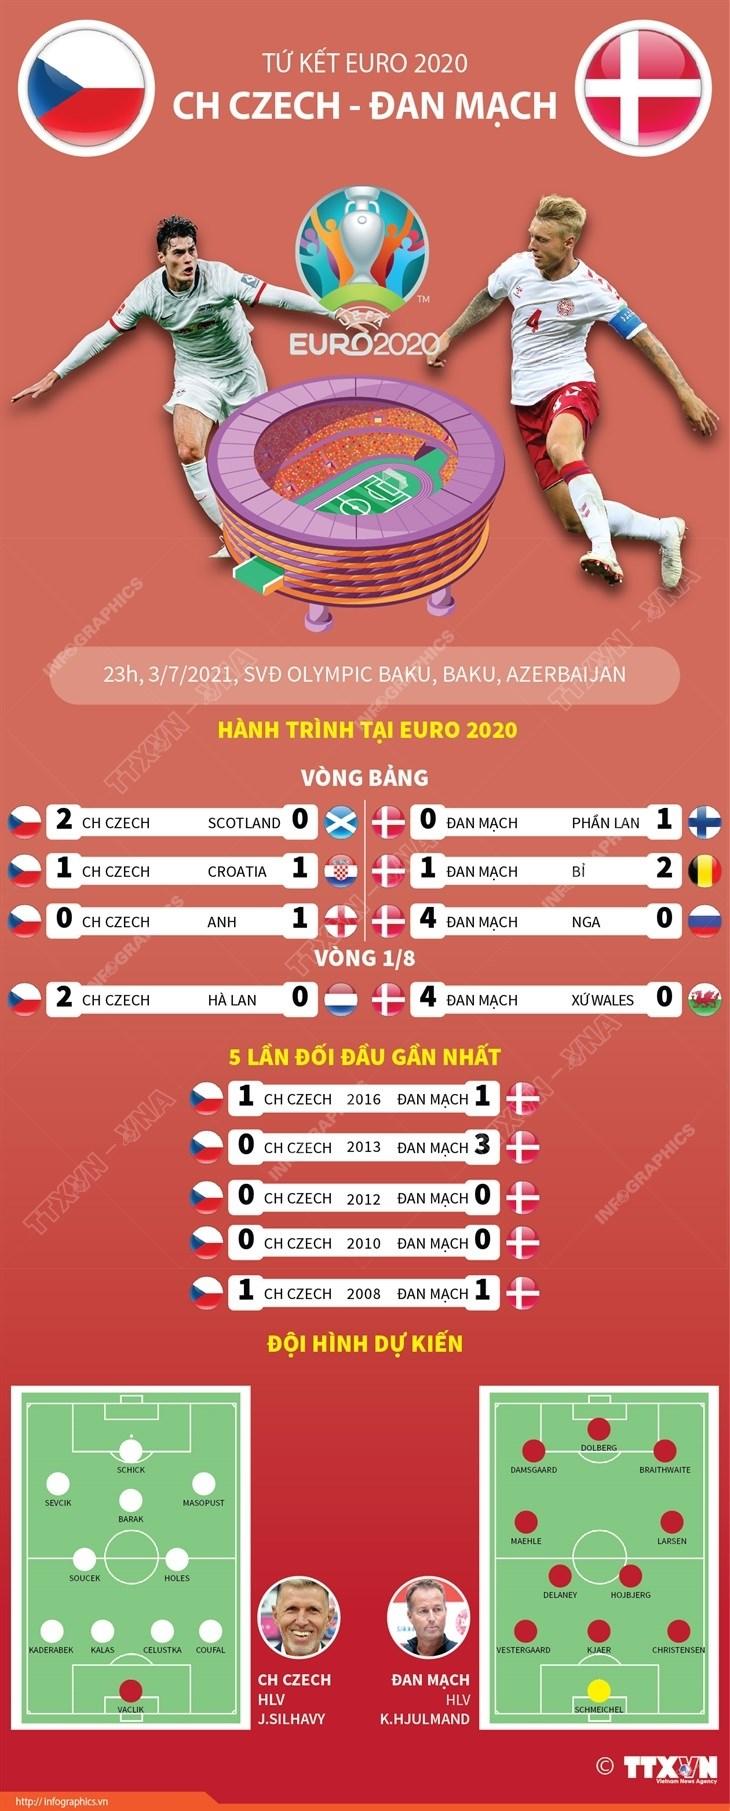 [Infographics] Tuong quan luc luong tran Cong hoa Sec-Dan Mach hinh anh 1